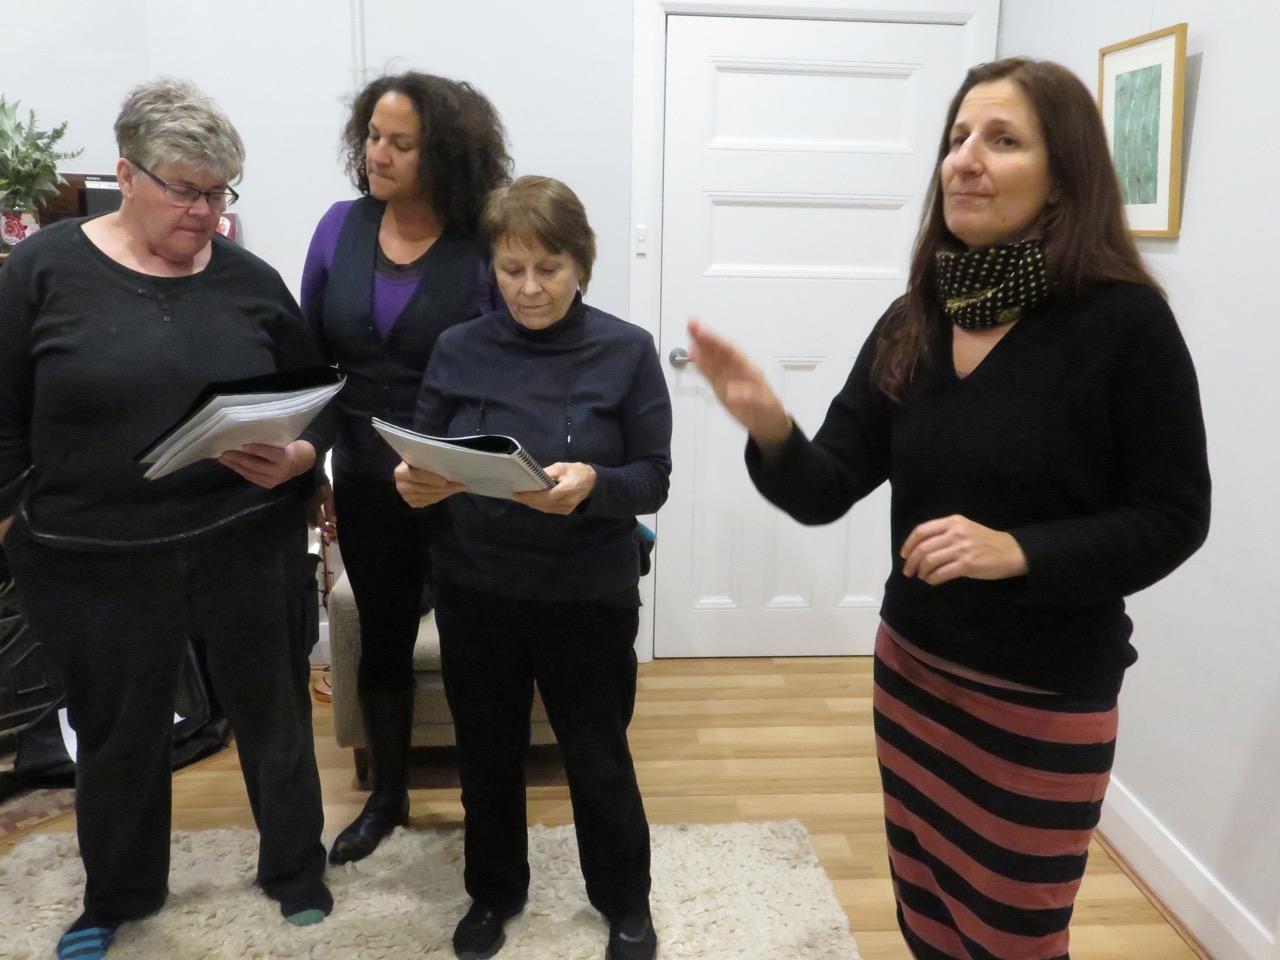 7_Tender_Community_Choir practice with Malika Reese and Jodi Phillis.jpg